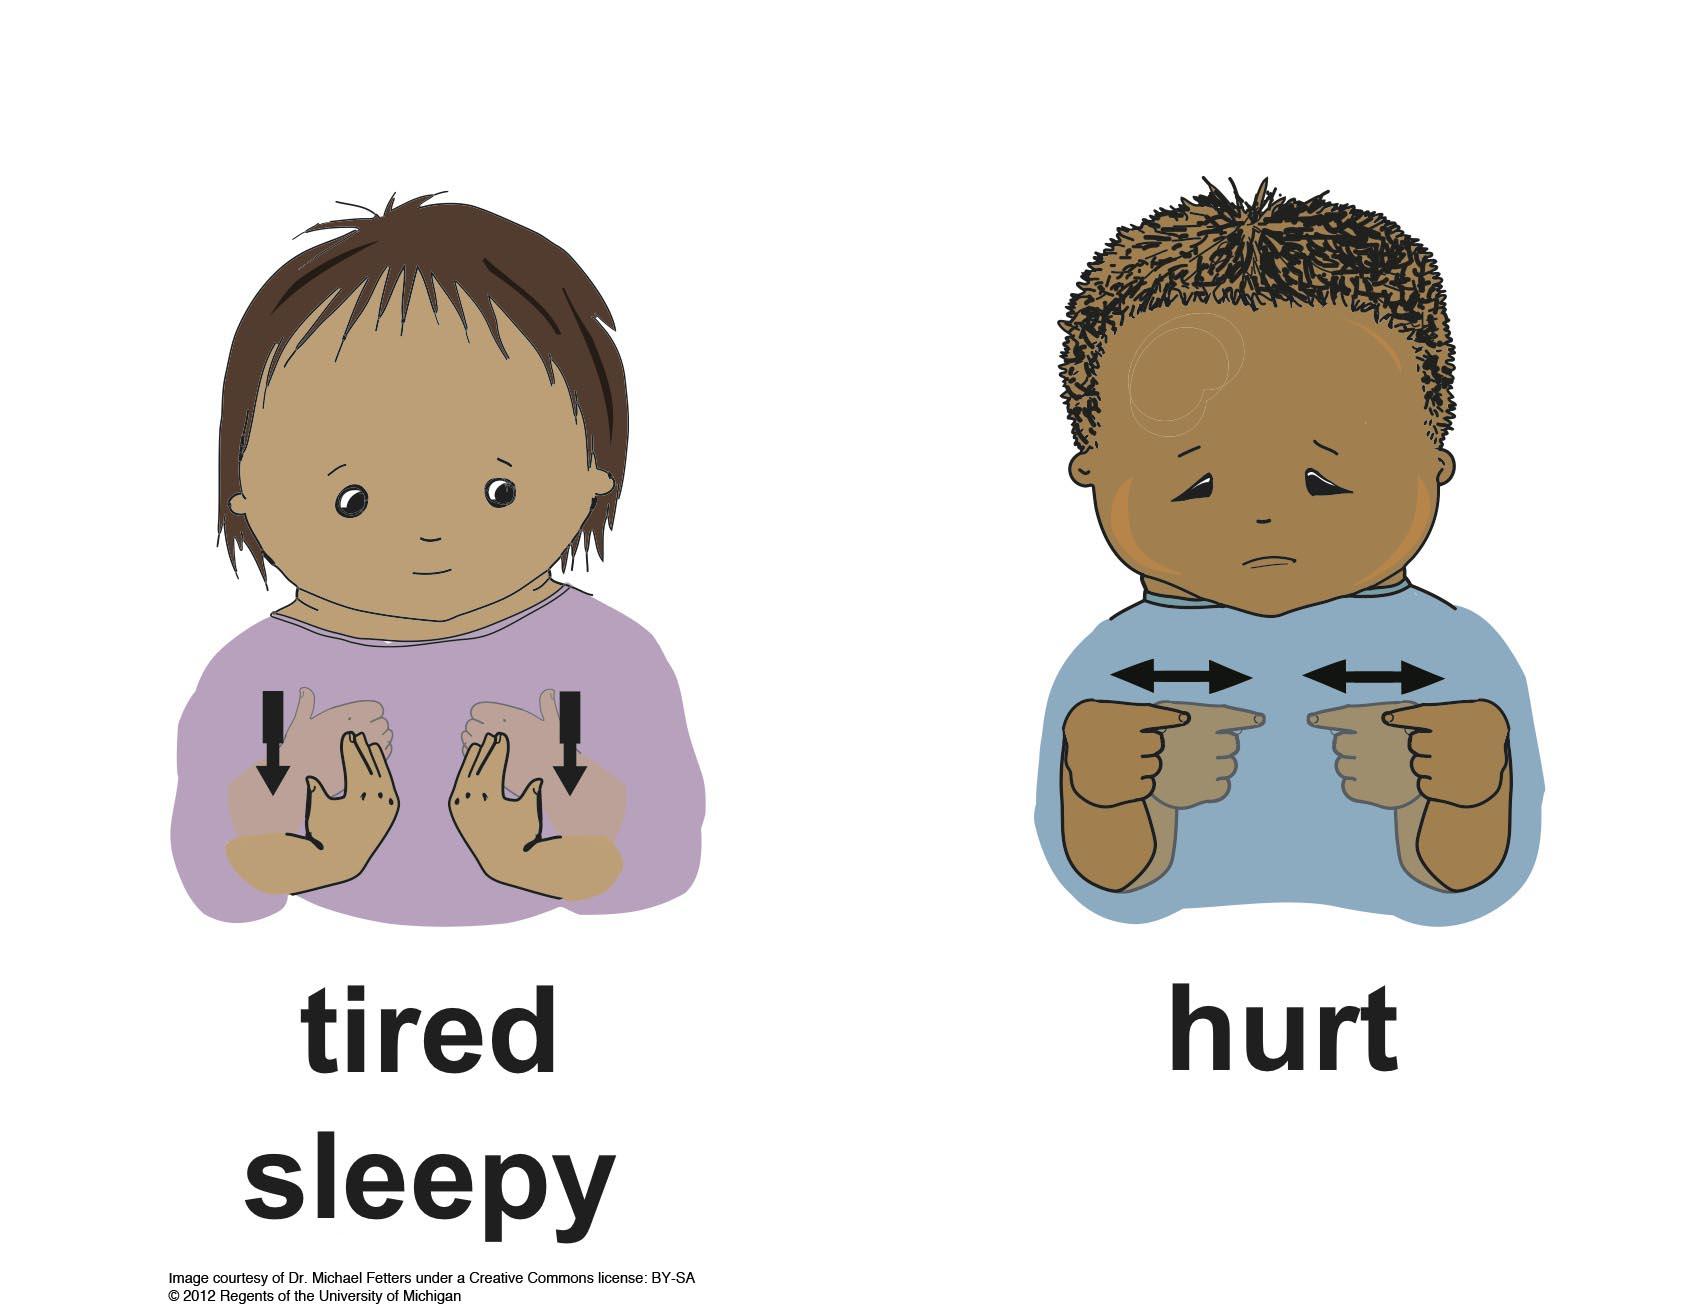 JFHP SWYB Tired Sleepy Hurt